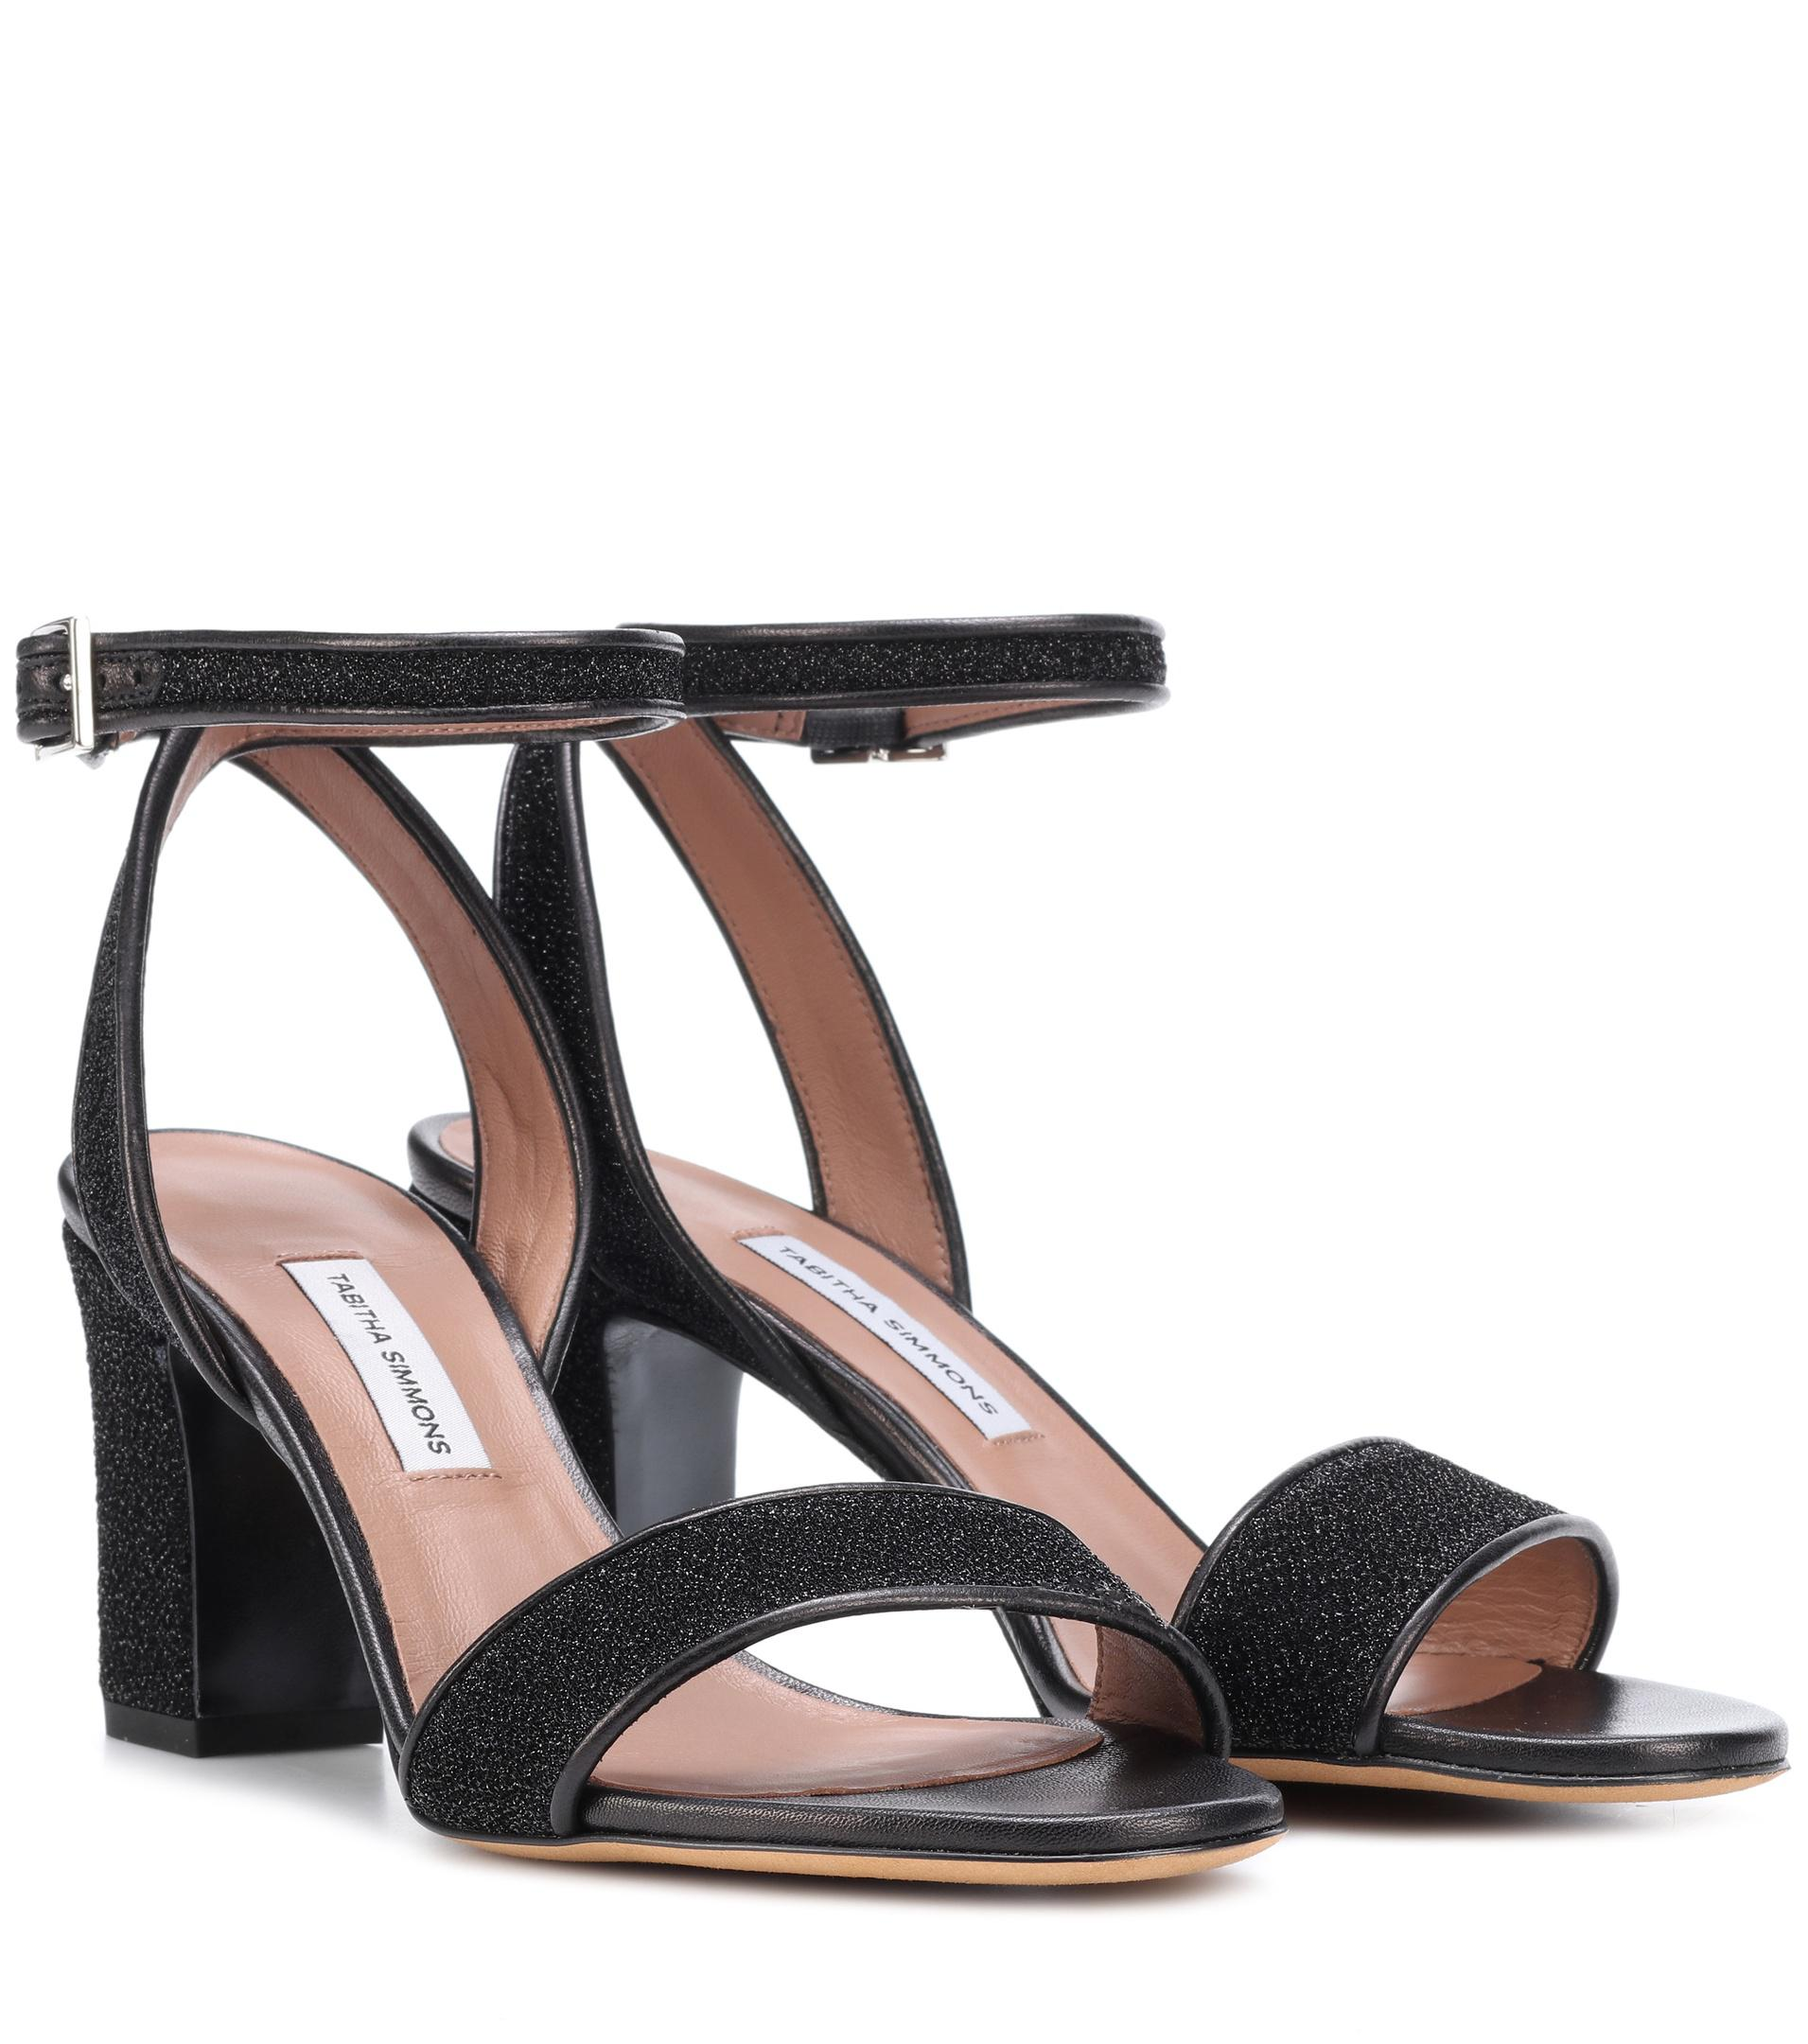 d8a577685c8 Tabitha Simmons - Black Leticia Metallic Sandals - Lyst. View fullscreen